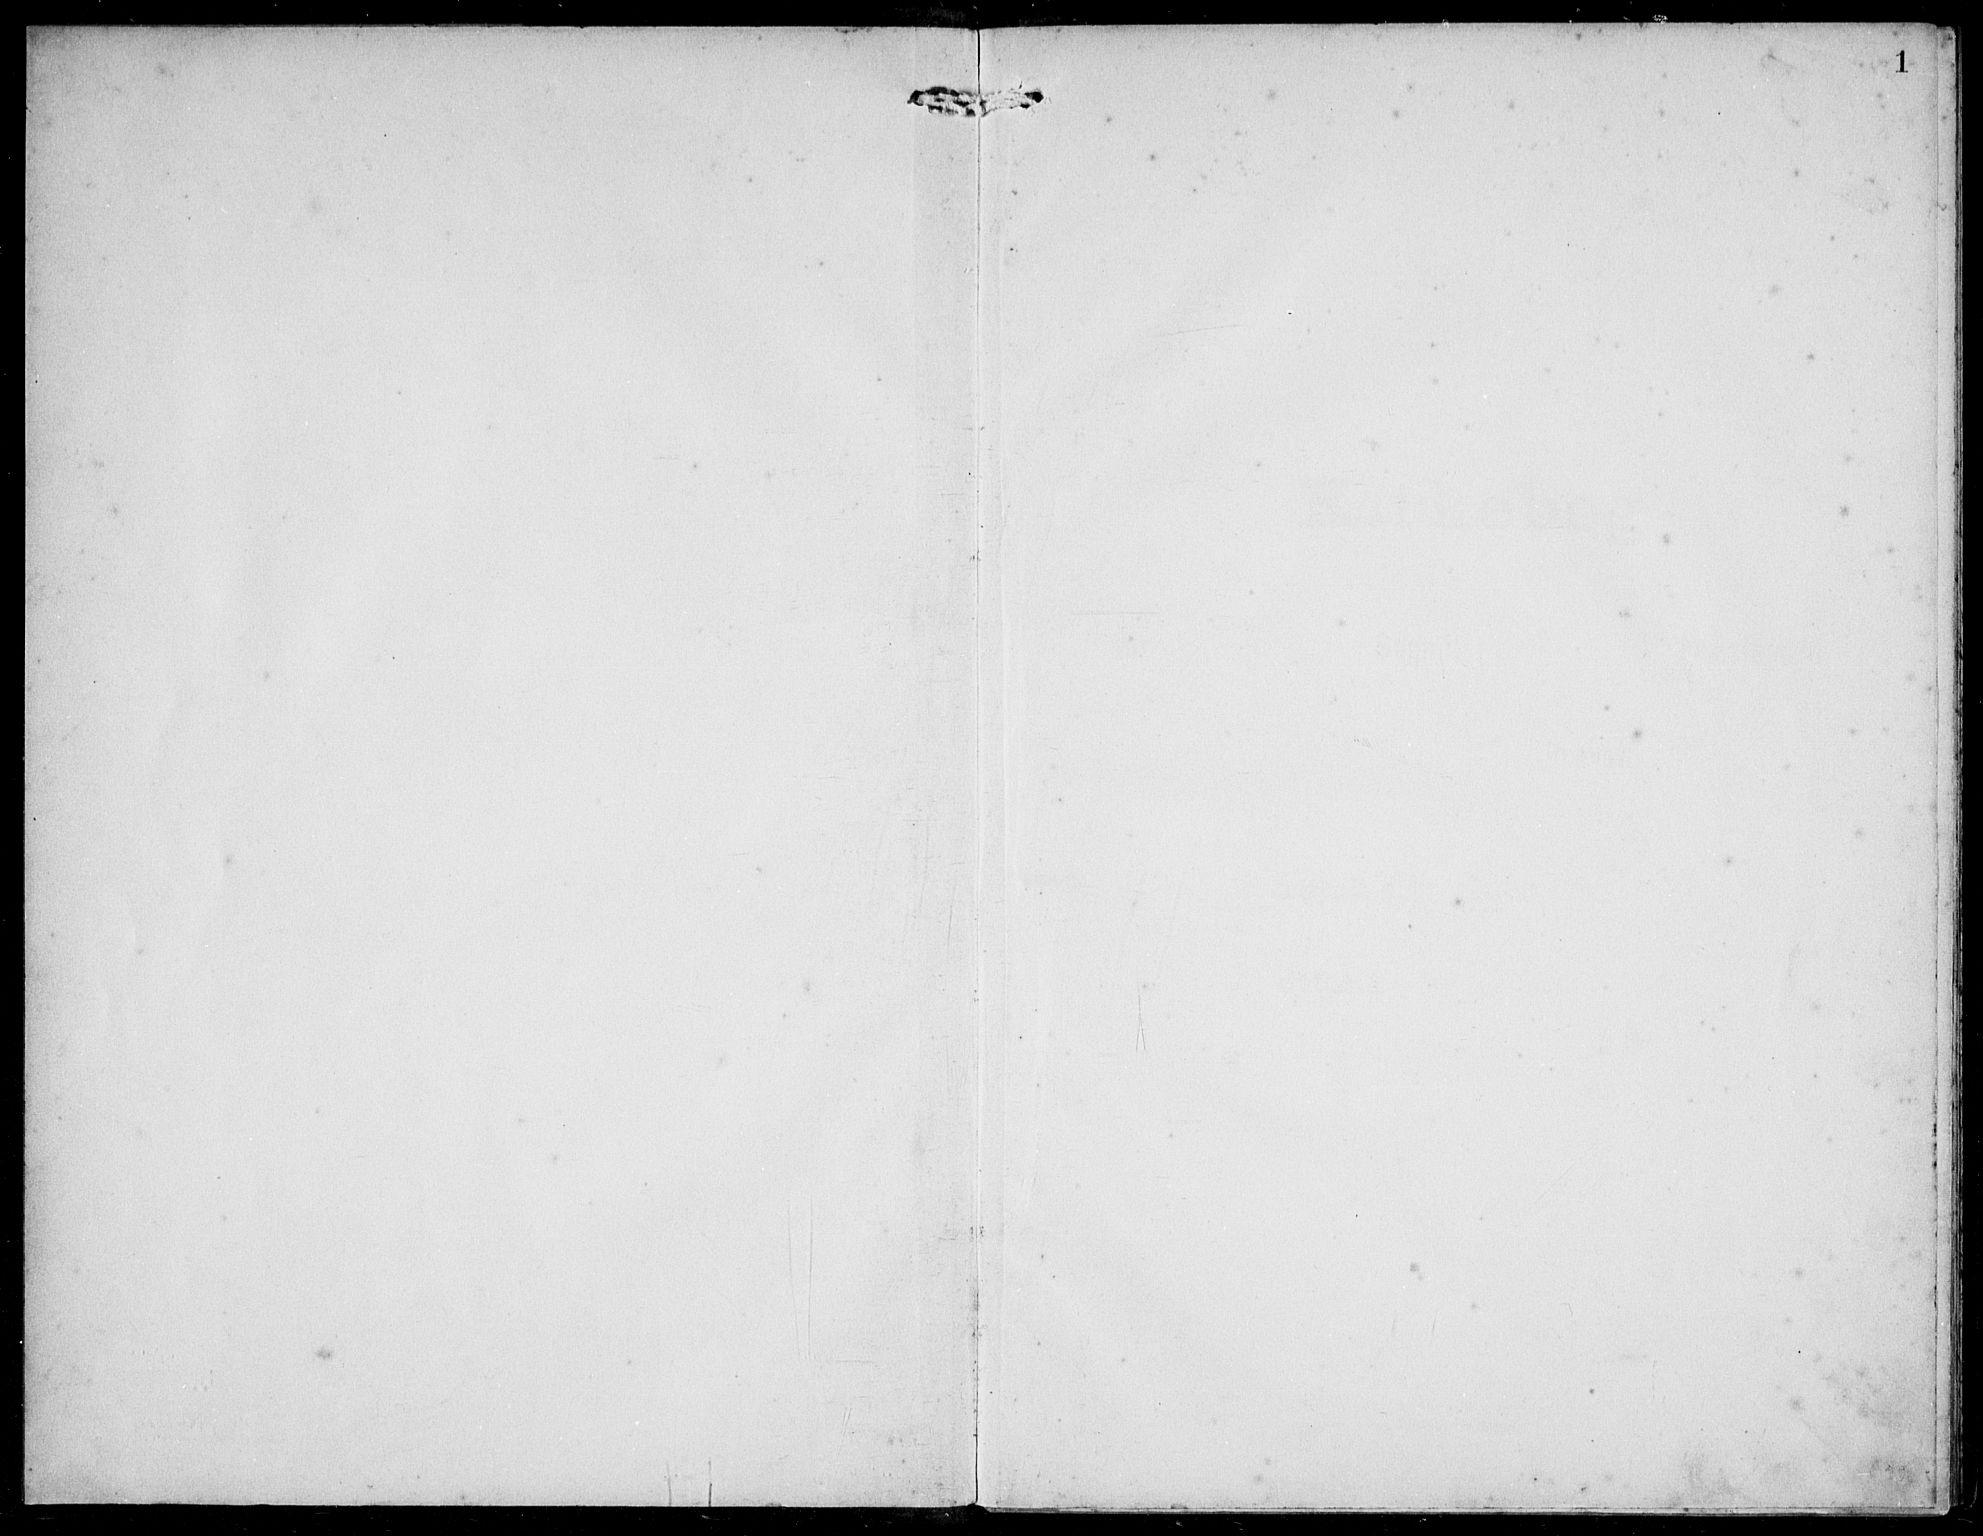 SAB, Solund sokneprestembete, Ministerialbok nr. B  1, 1891-1901, s. 1